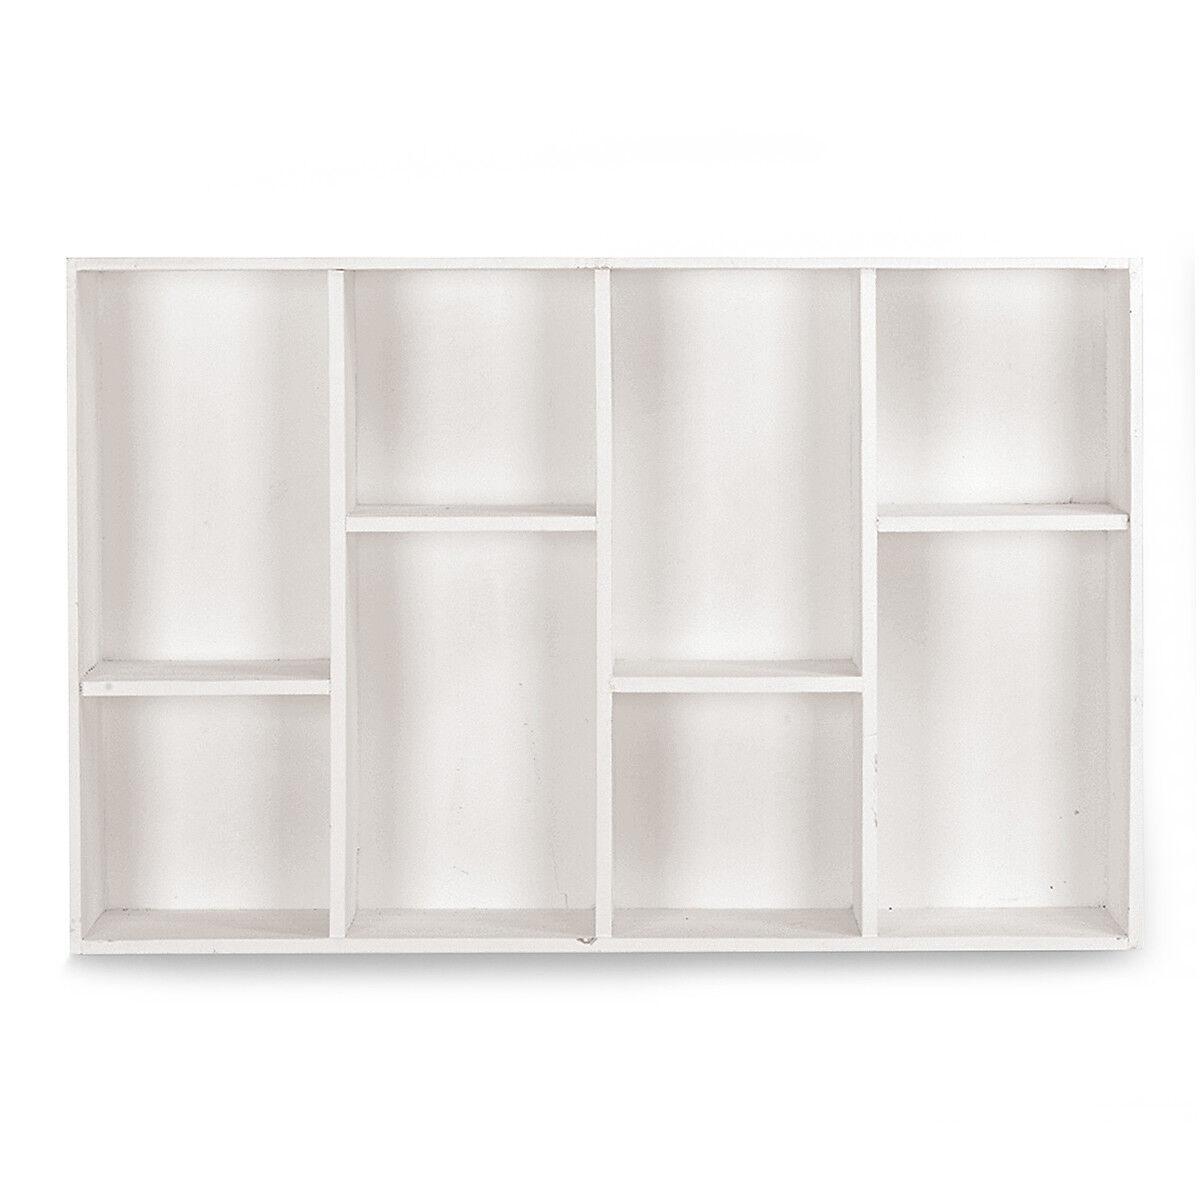 setzkasten holz wei ca l 81 x t 13 x h 52 5 cm depot de. Black Bedroom Furniture Sets. Home Design Ideas